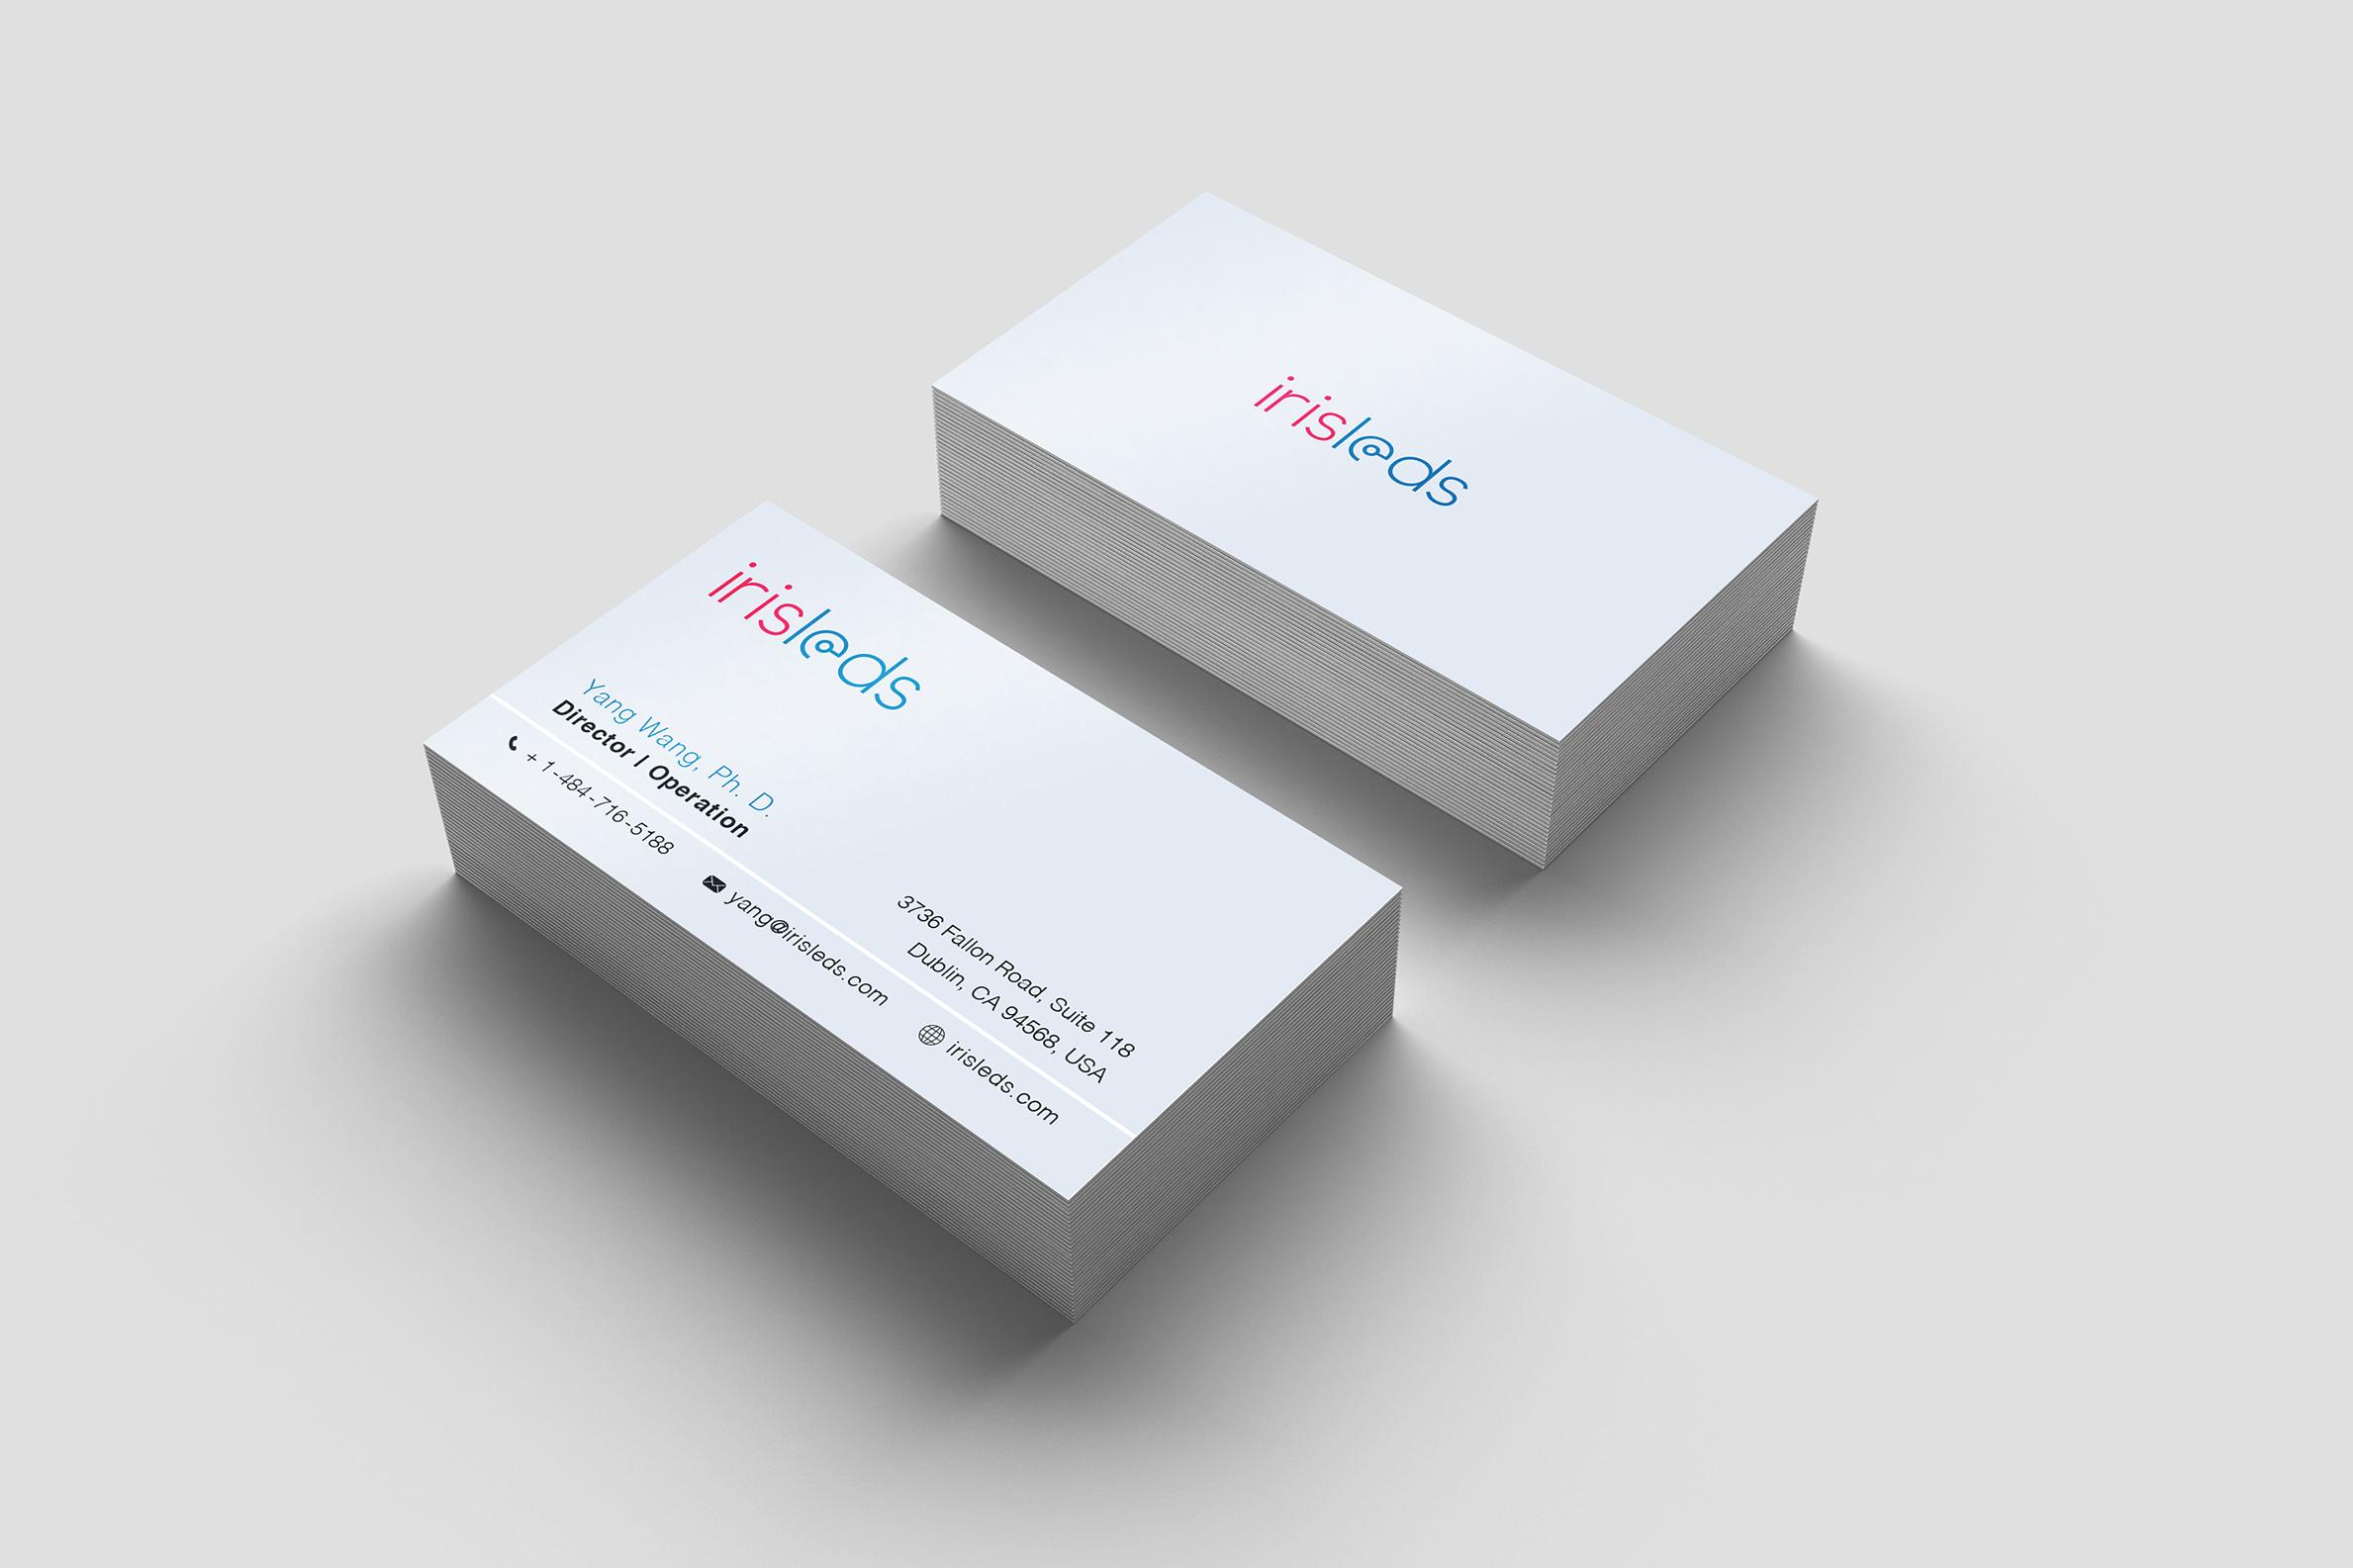 Business-Cards-Simulation_Iris-Leds